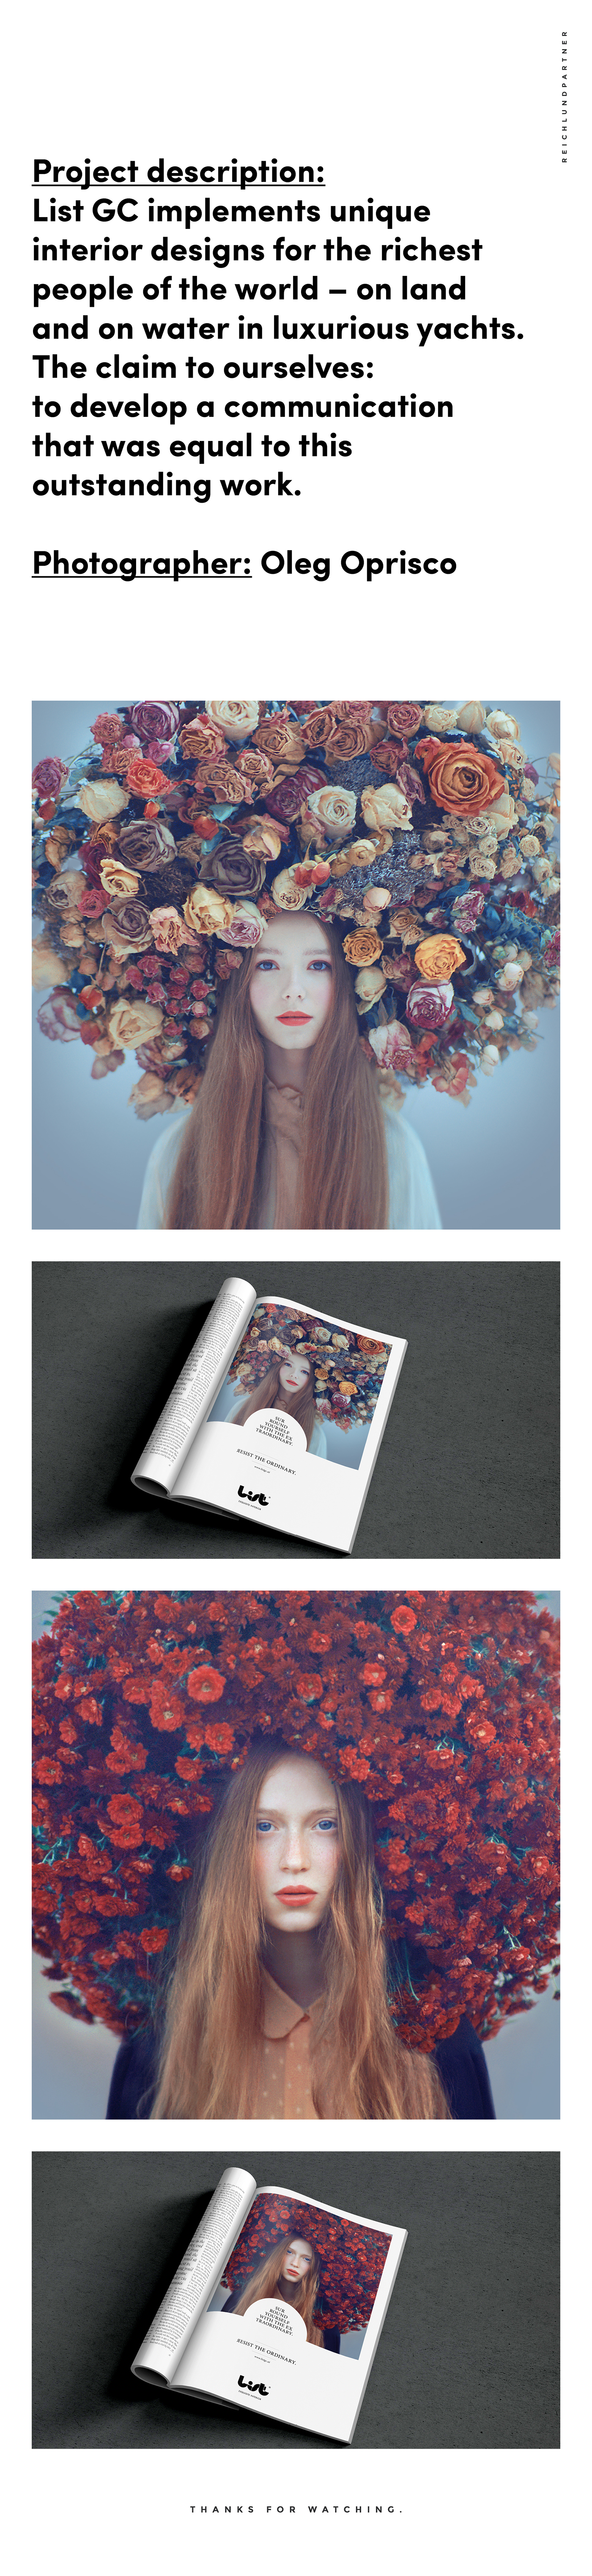 list Reichl oleg oprisco Photography  Advertising  award